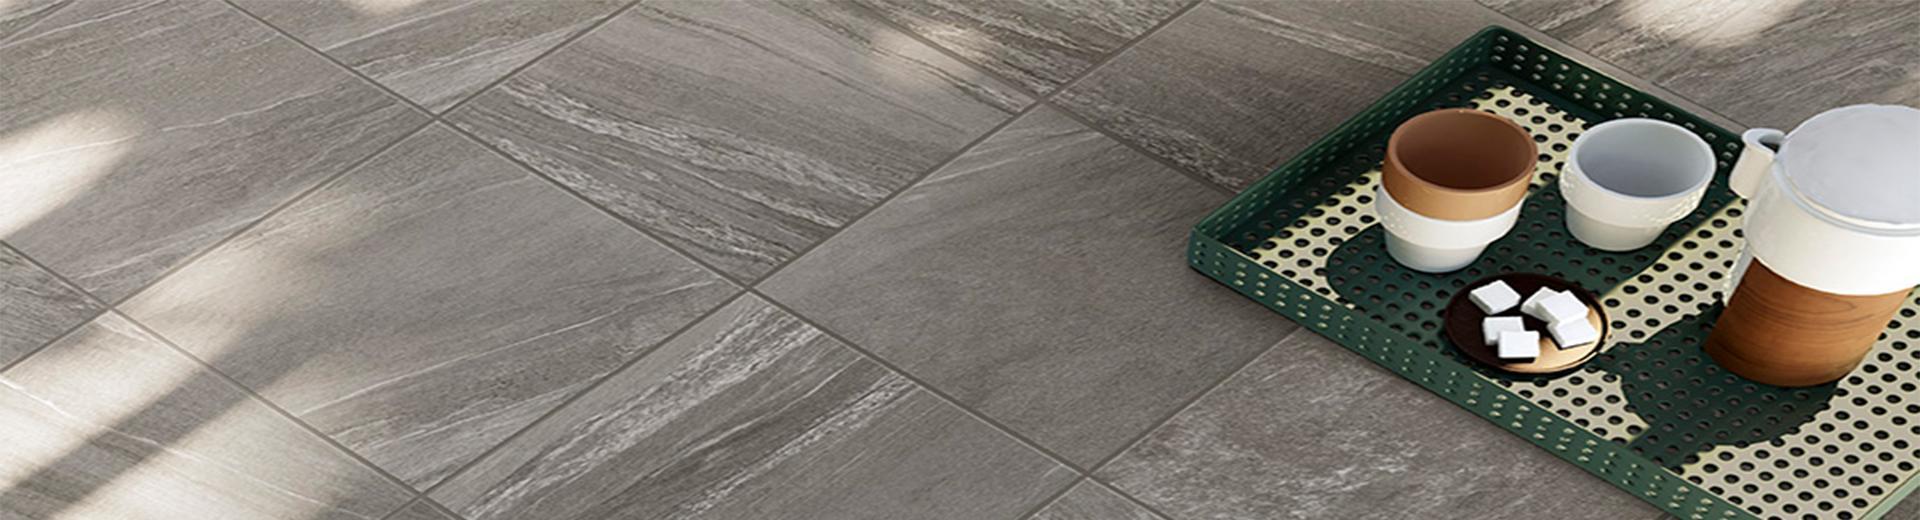 Tile Suppliers Tile Supply Uk Floor Tiles Ceramic Metro